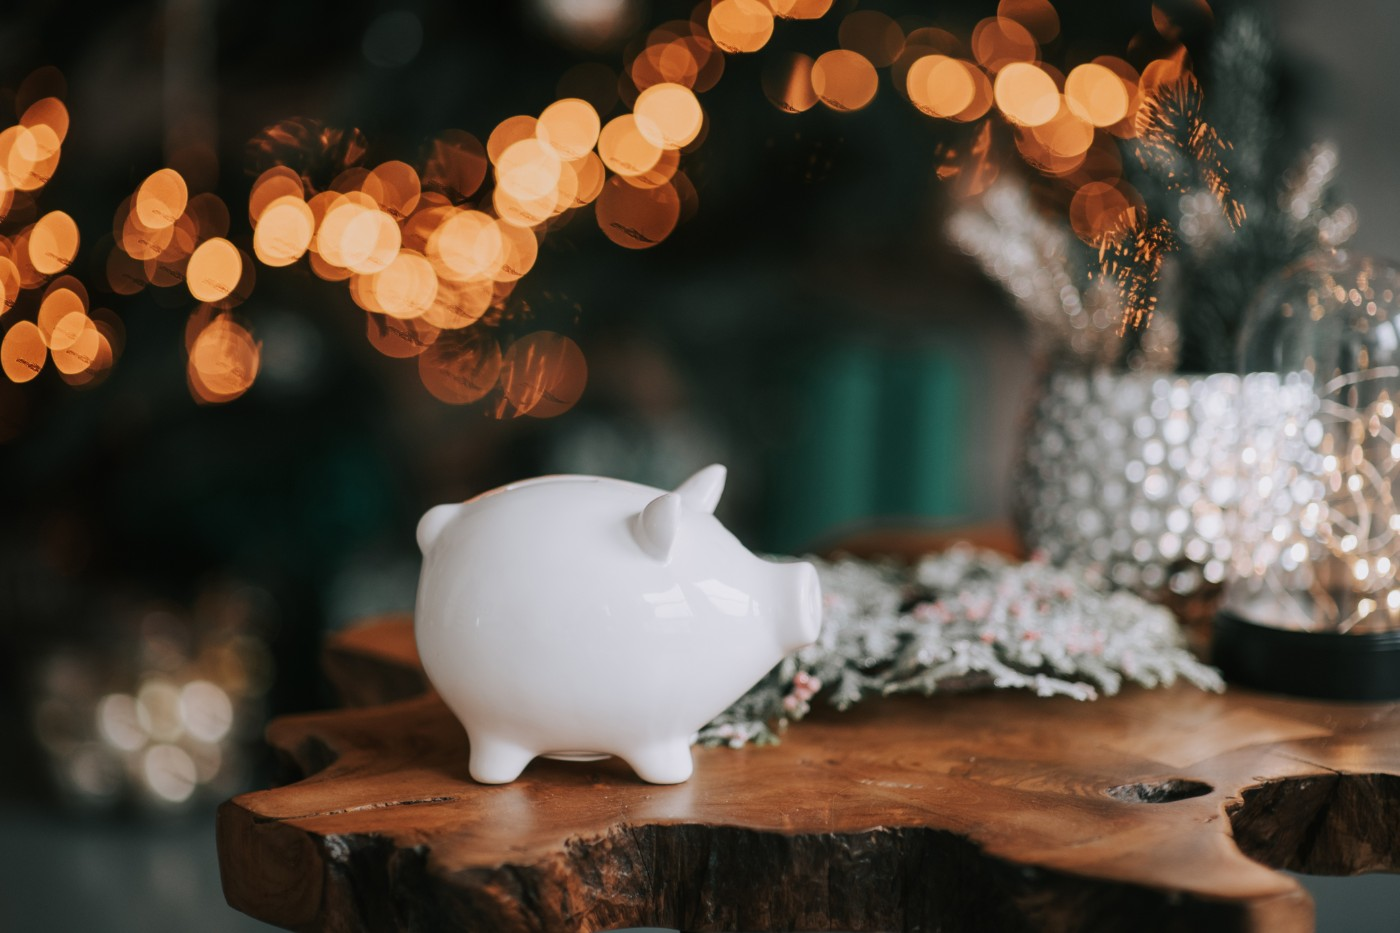 https://tickertapecdn.tdameritrade.com/assets/images/pages/md/piggy bank: ideas for spending or saving your bonus